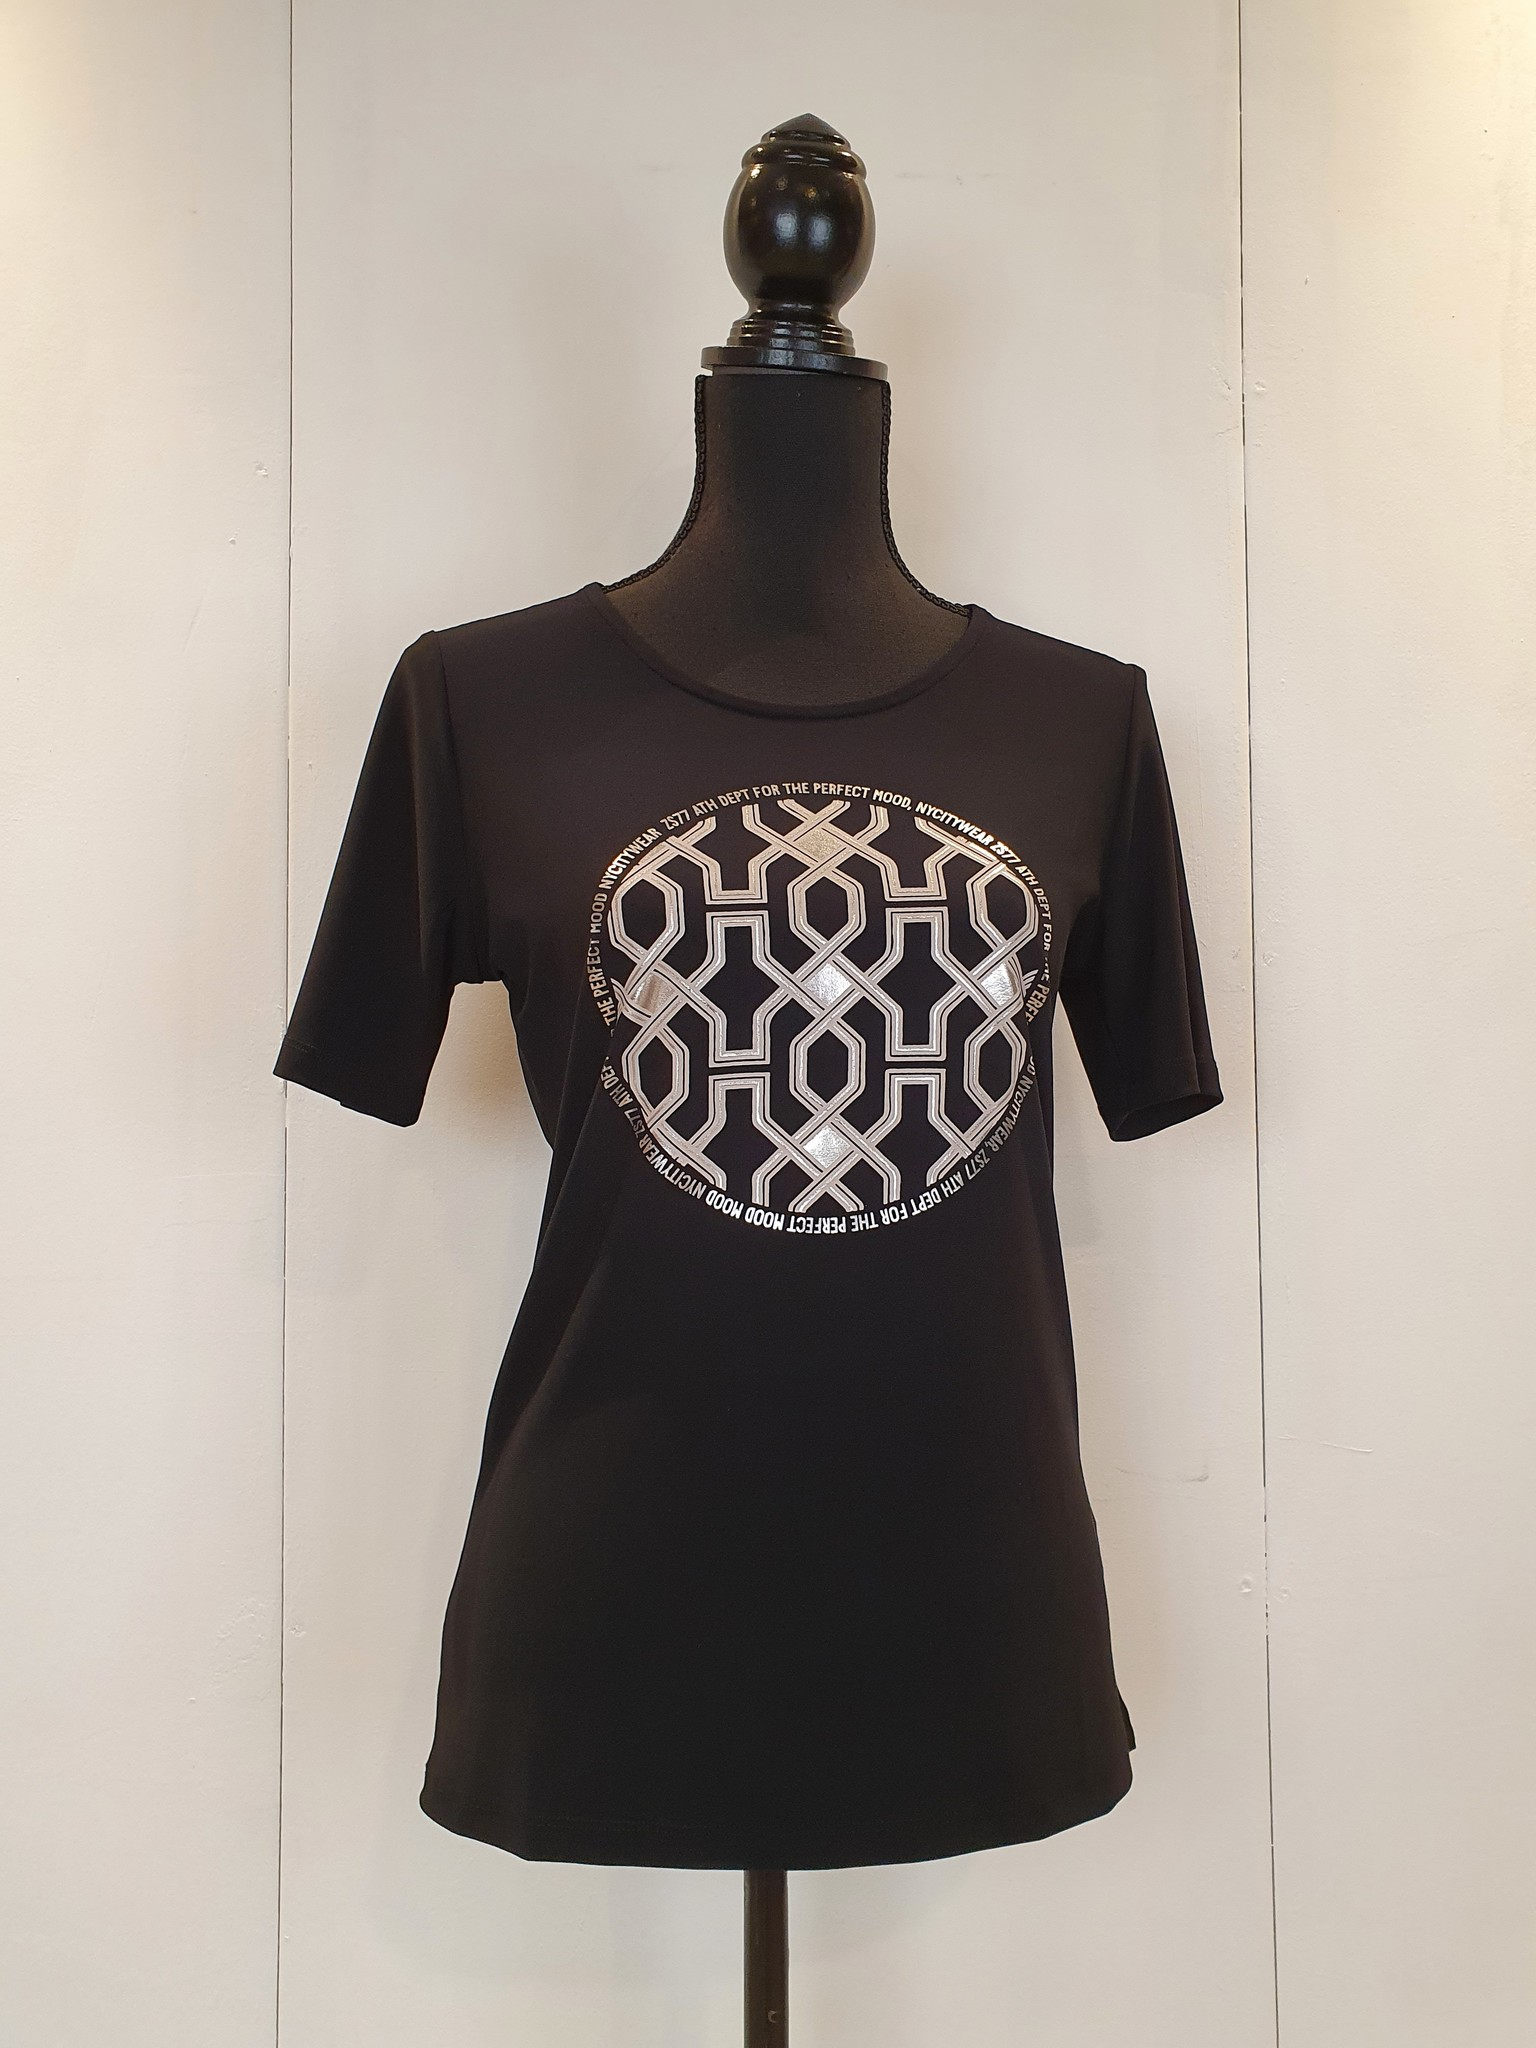 Zoso Zoso Marcella Splendour shirt with print  Black